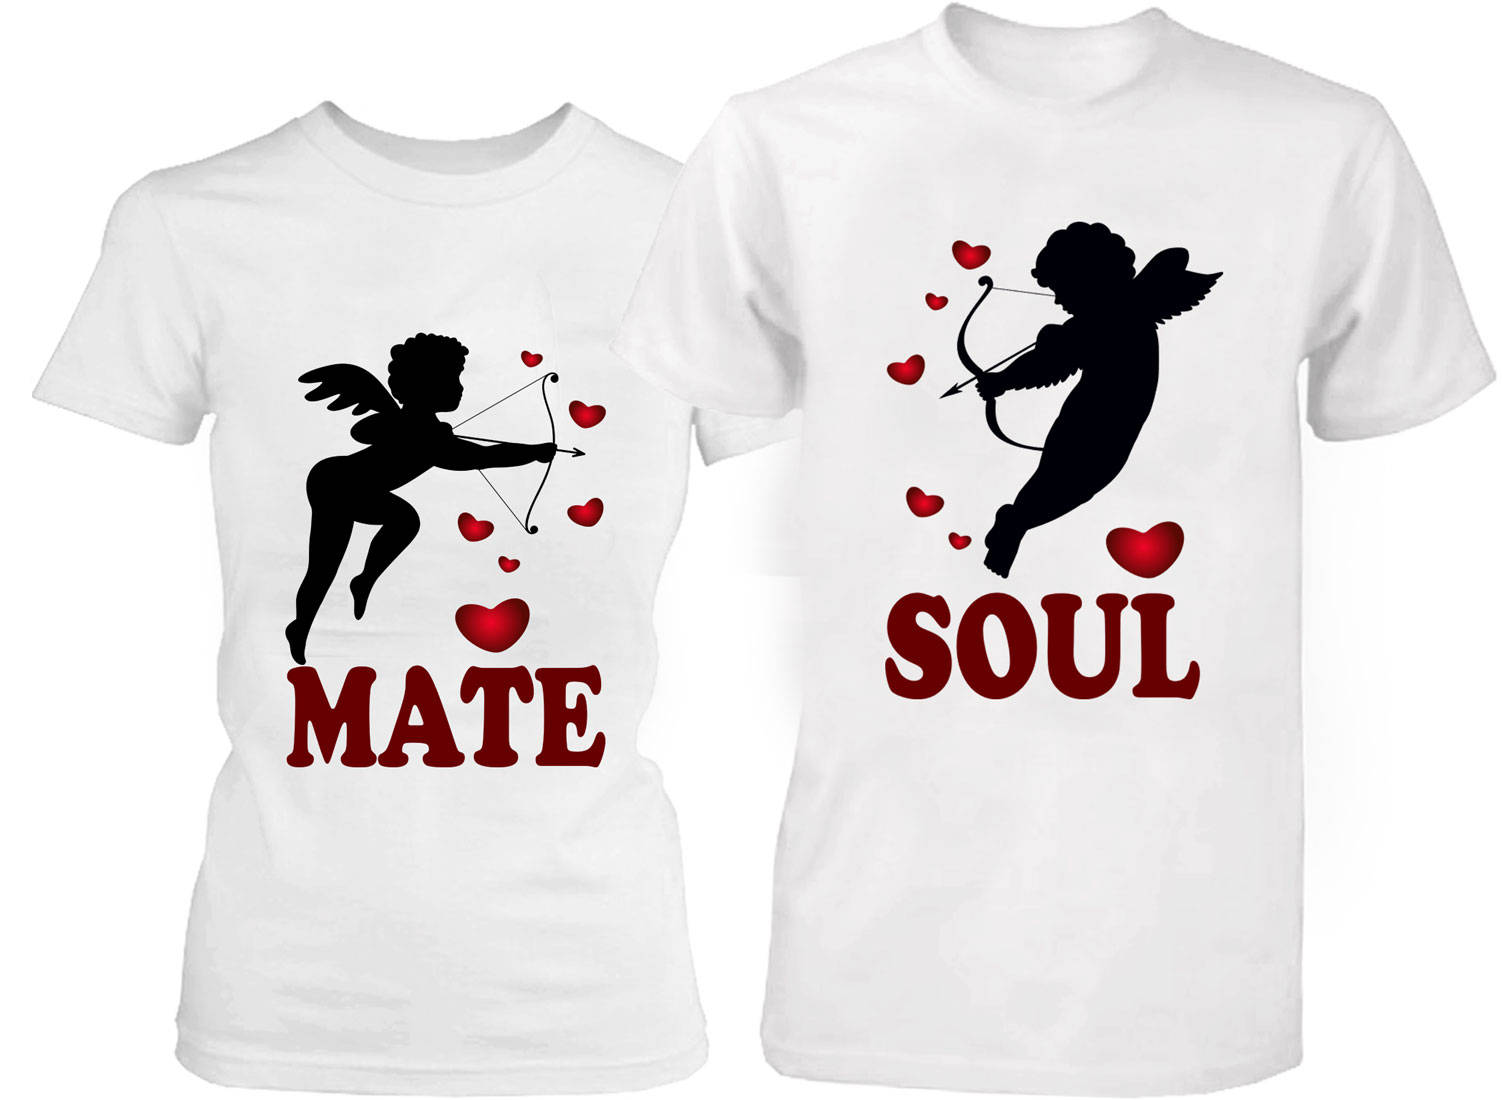 Couple Shirts Soul Mate Shirt Valentine's Day Shirts Love ...